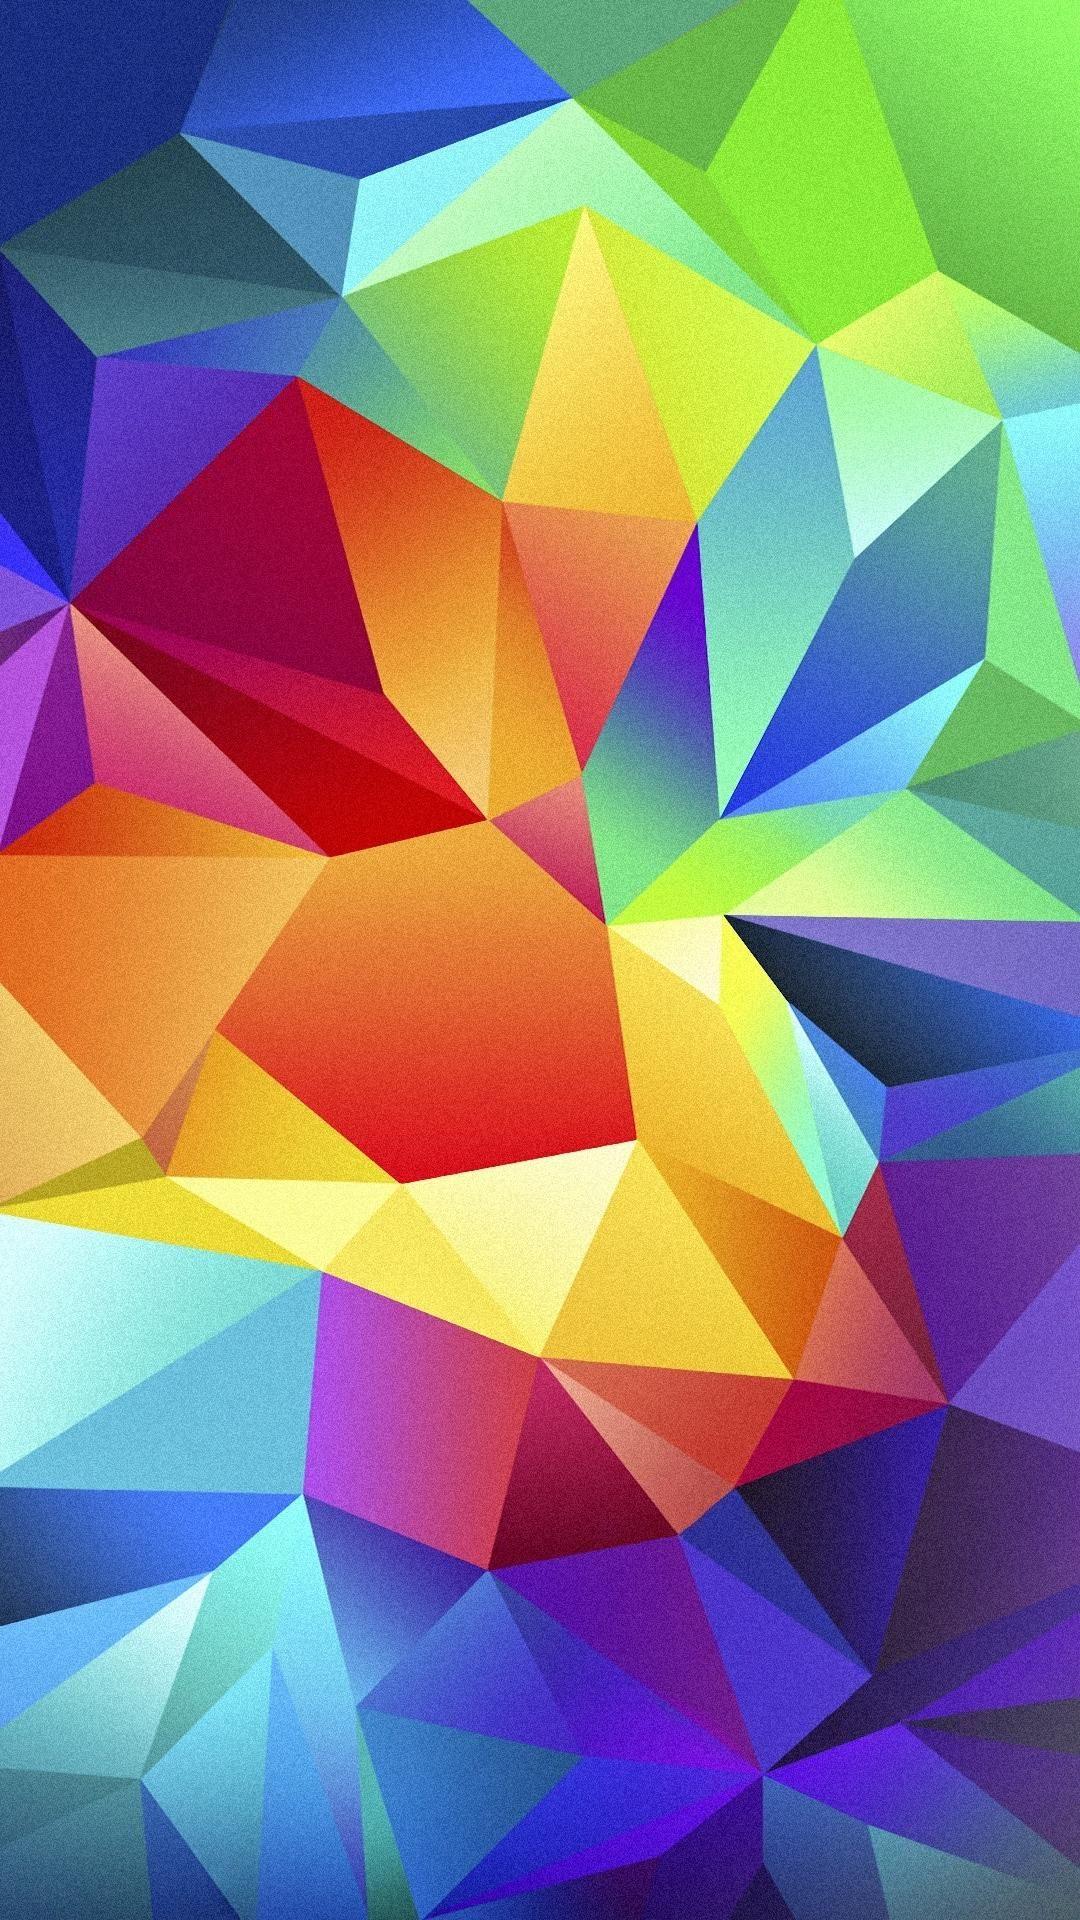 Samsung Galaxy S5 Wallpaper S5 Wallpaper Samsung Galaxy Wallpaper Galaxy Wallpaper